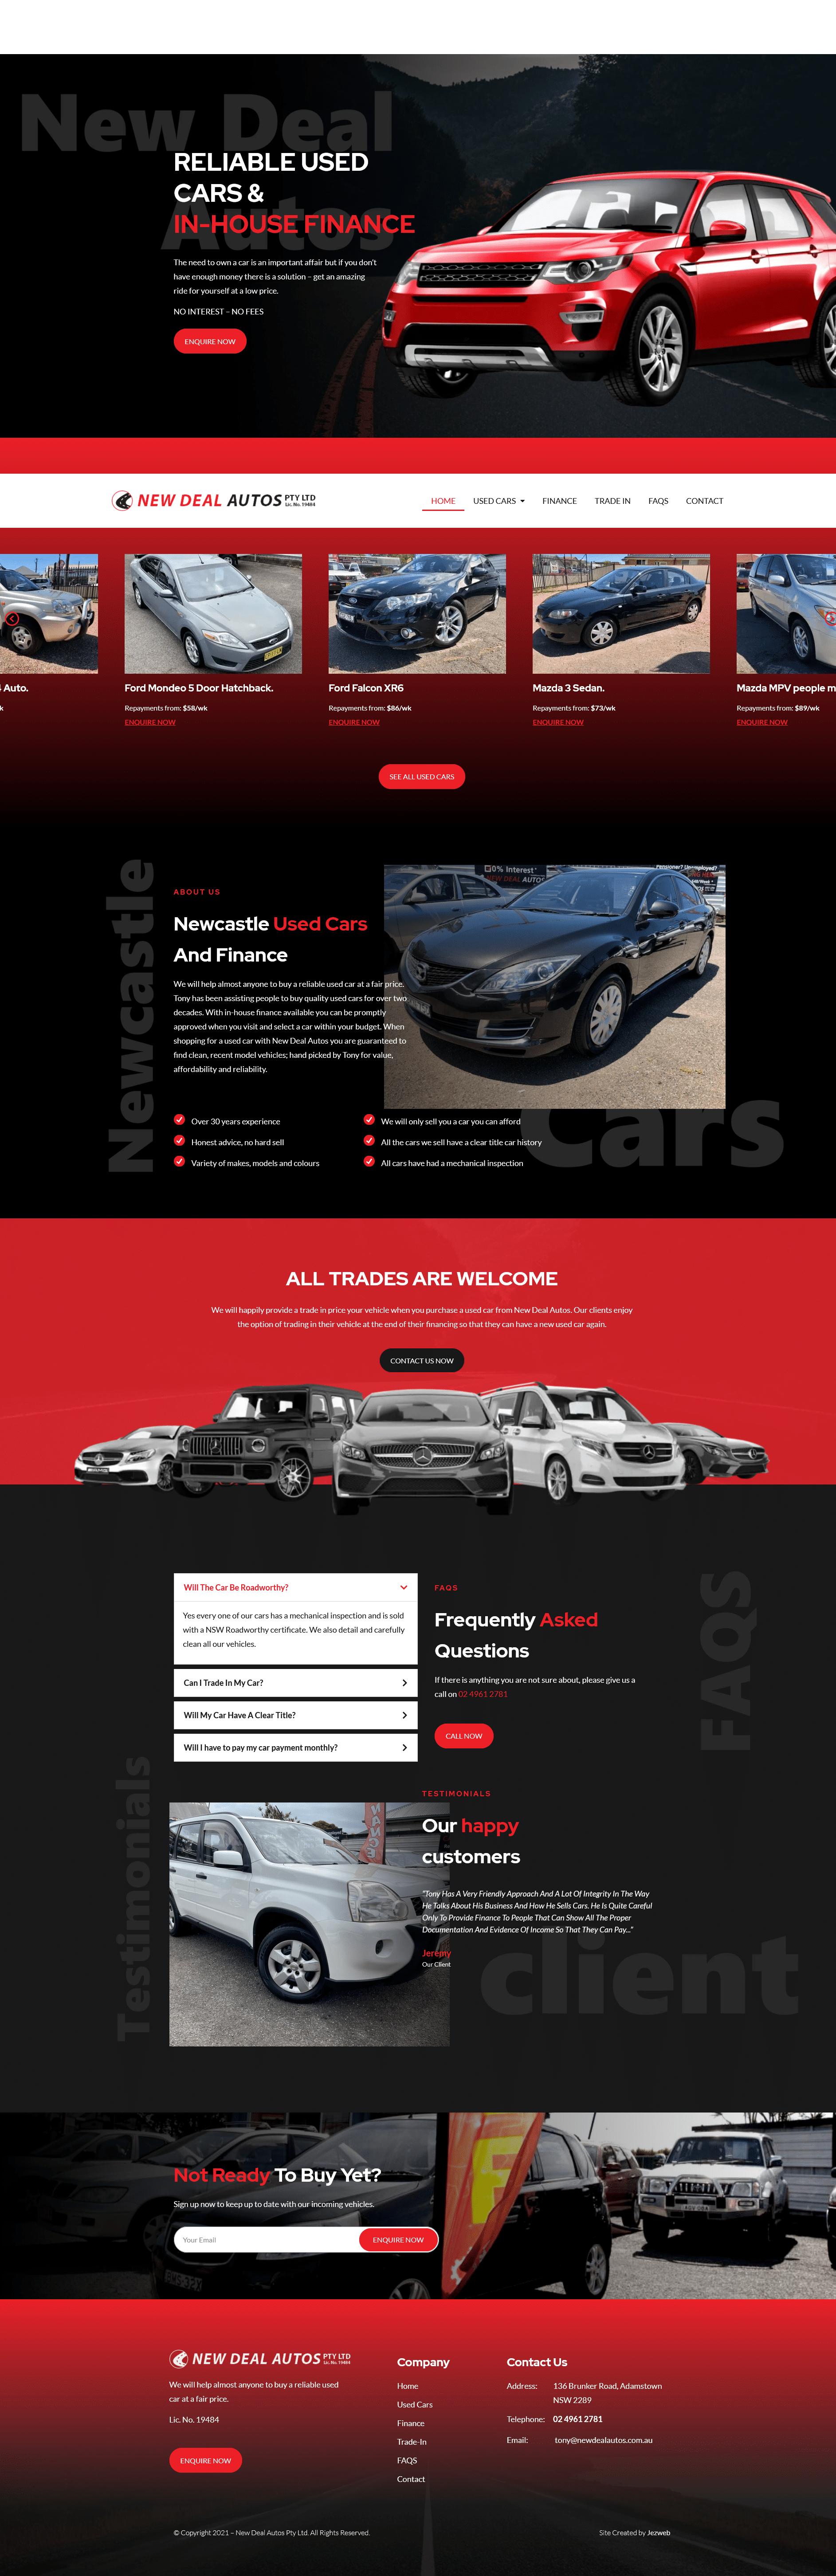 New Deal Autos -